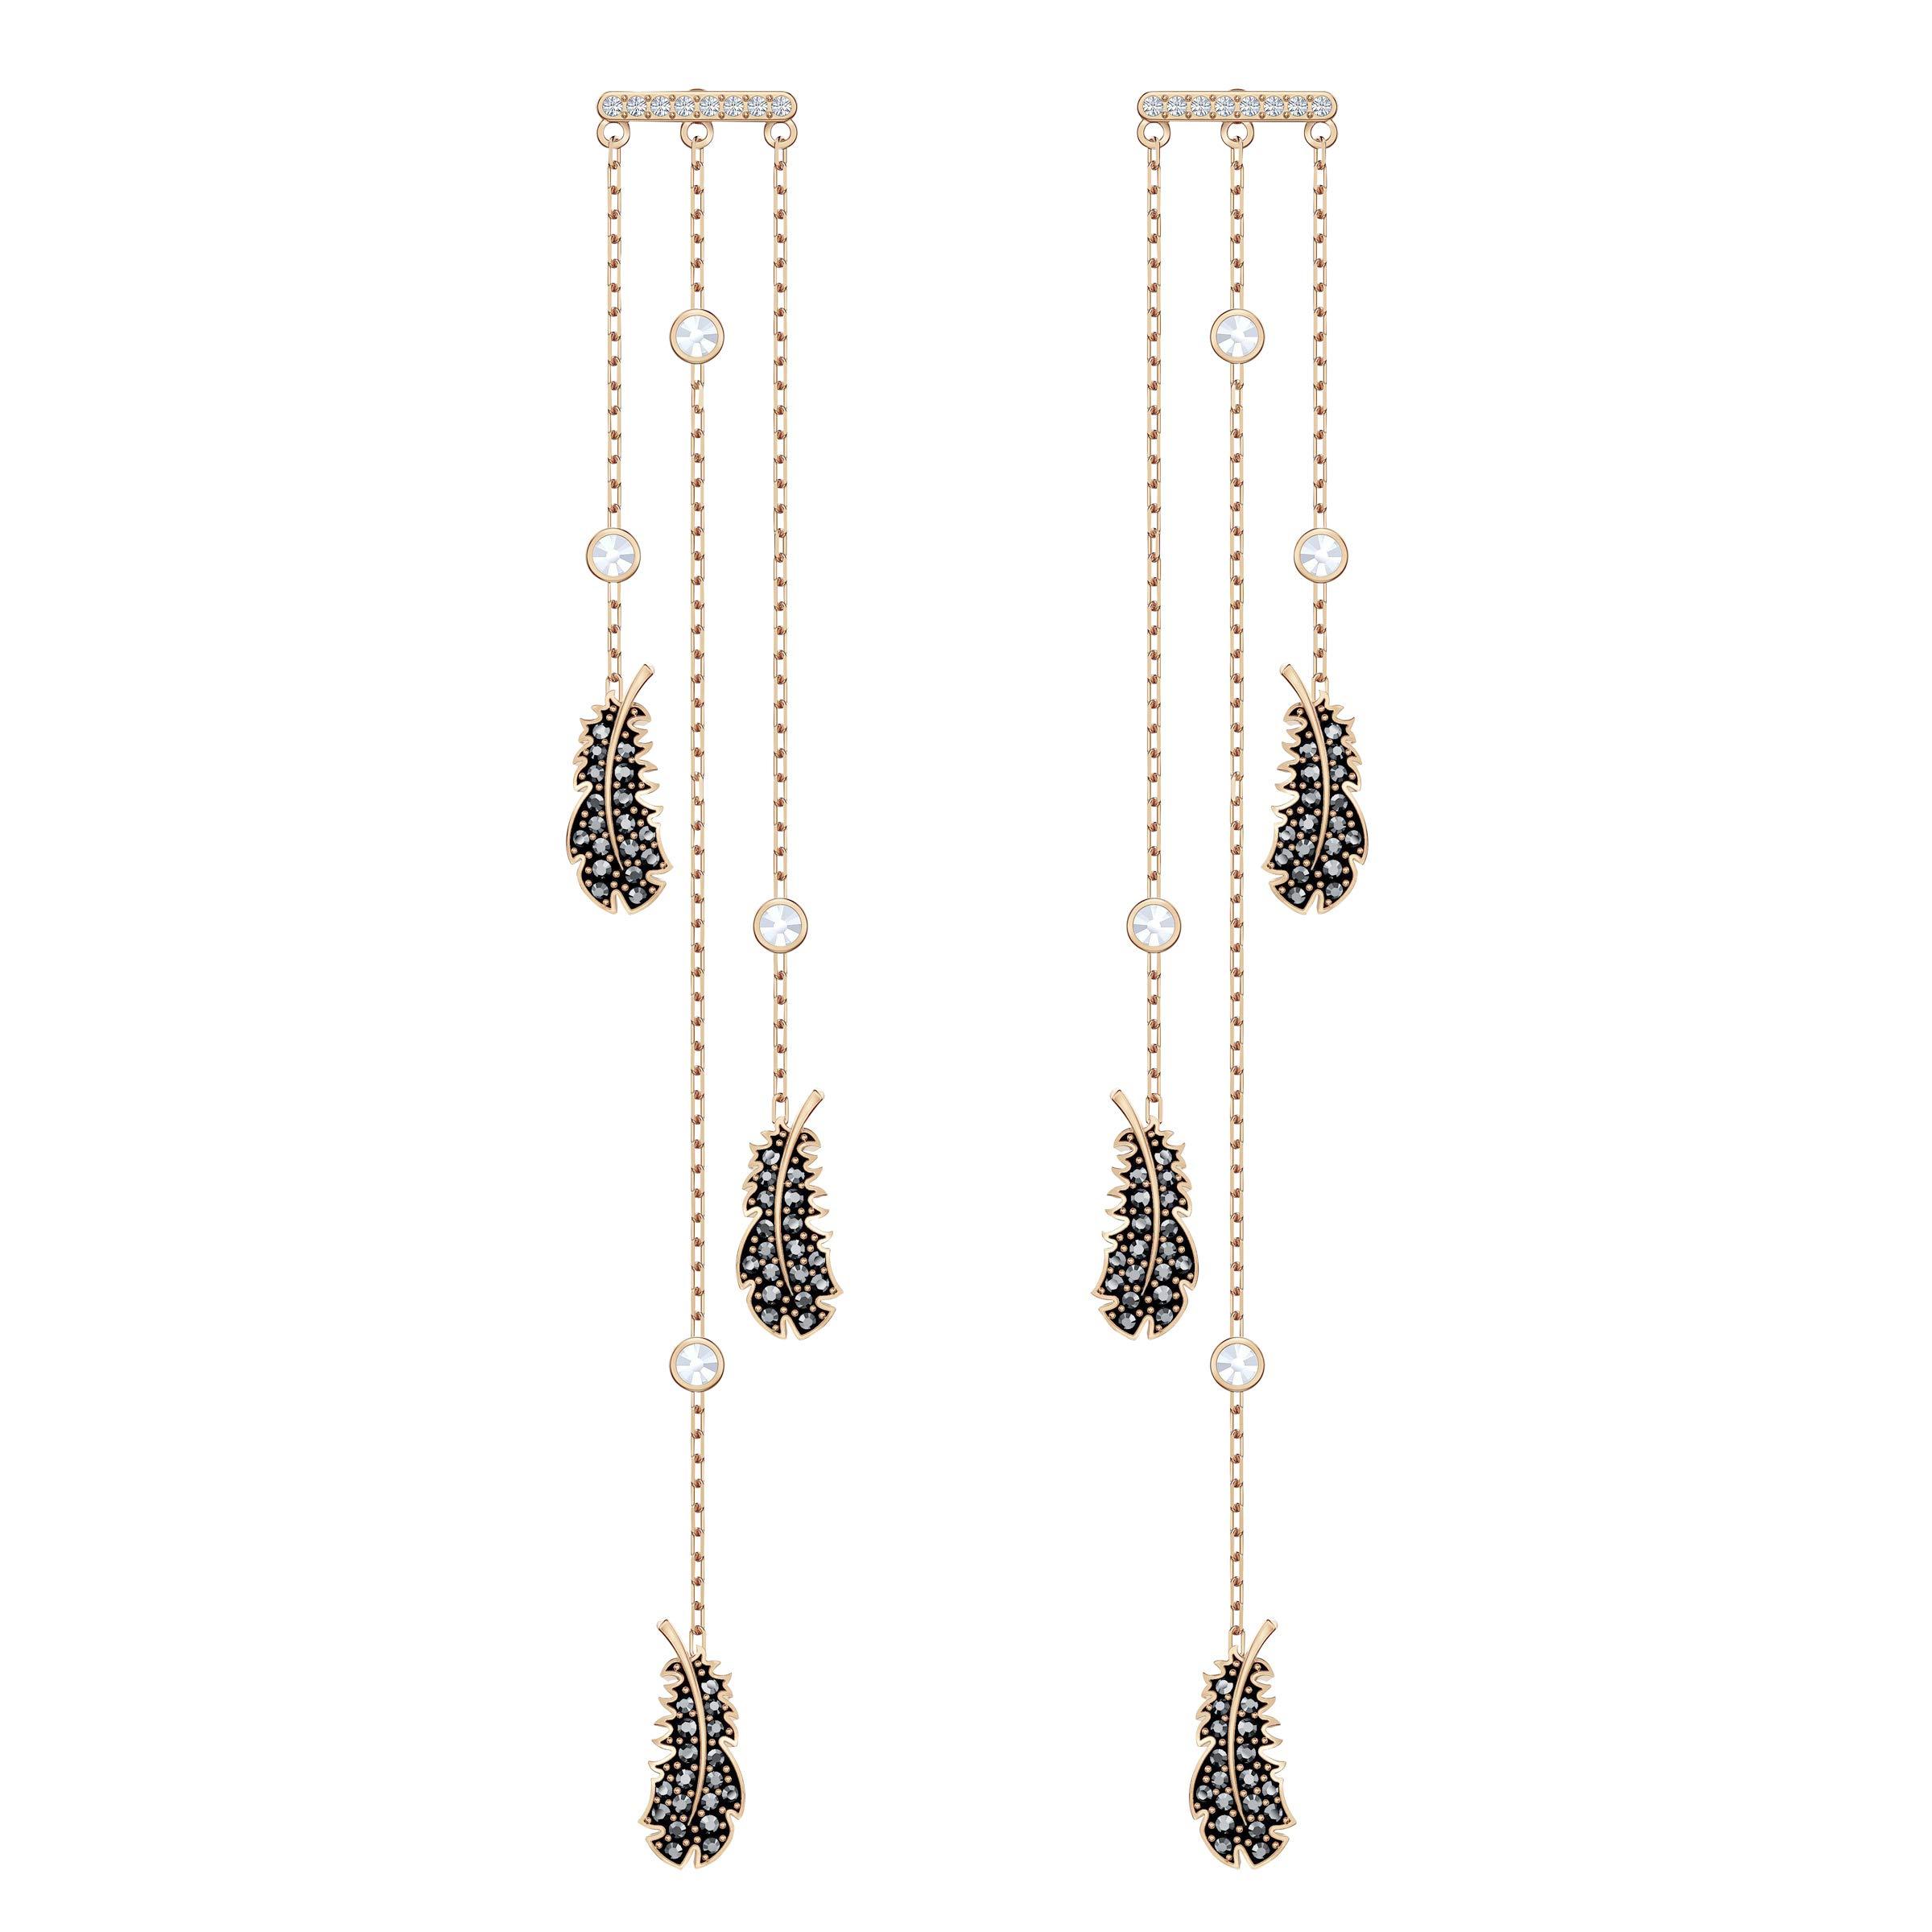 SWAROVSKI Women's Naughty Black/White Crystal Jewelry Collection